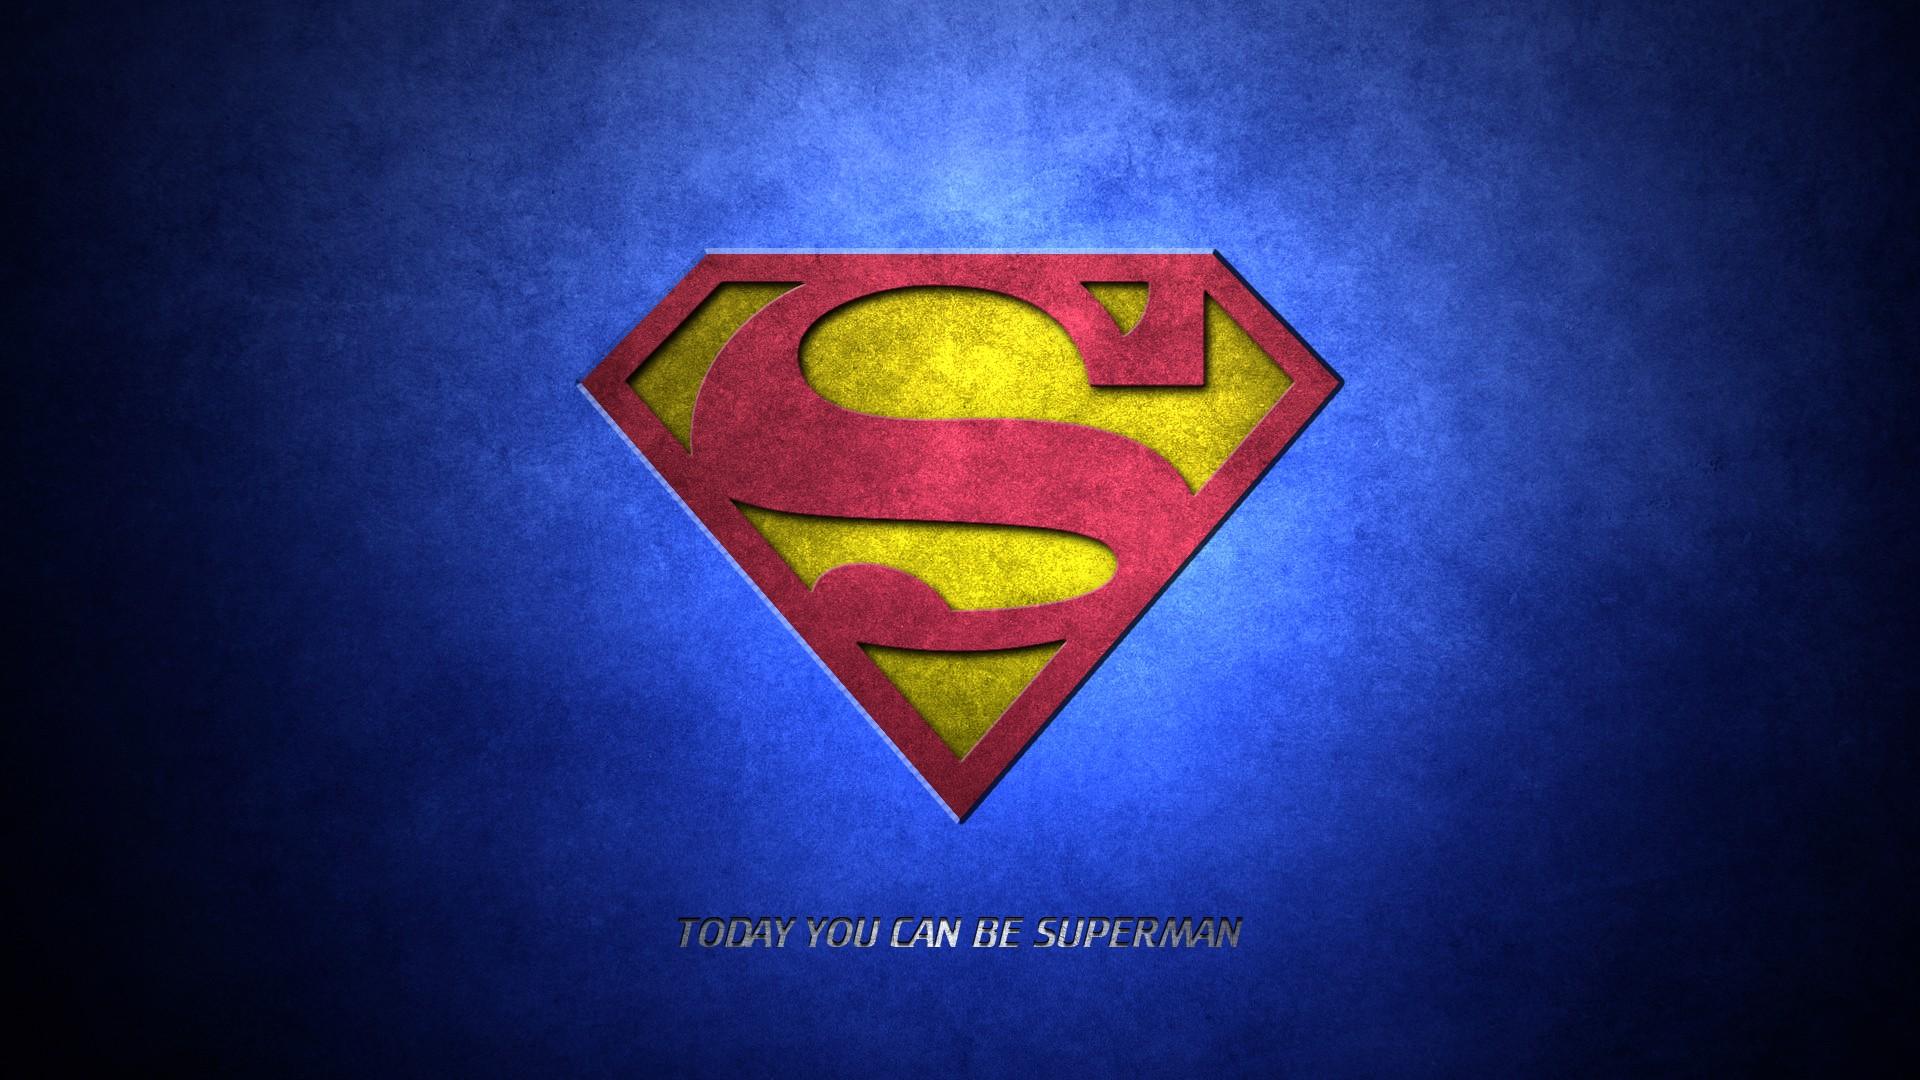 Wallpaper Illustration Text Logo Superhero Superman